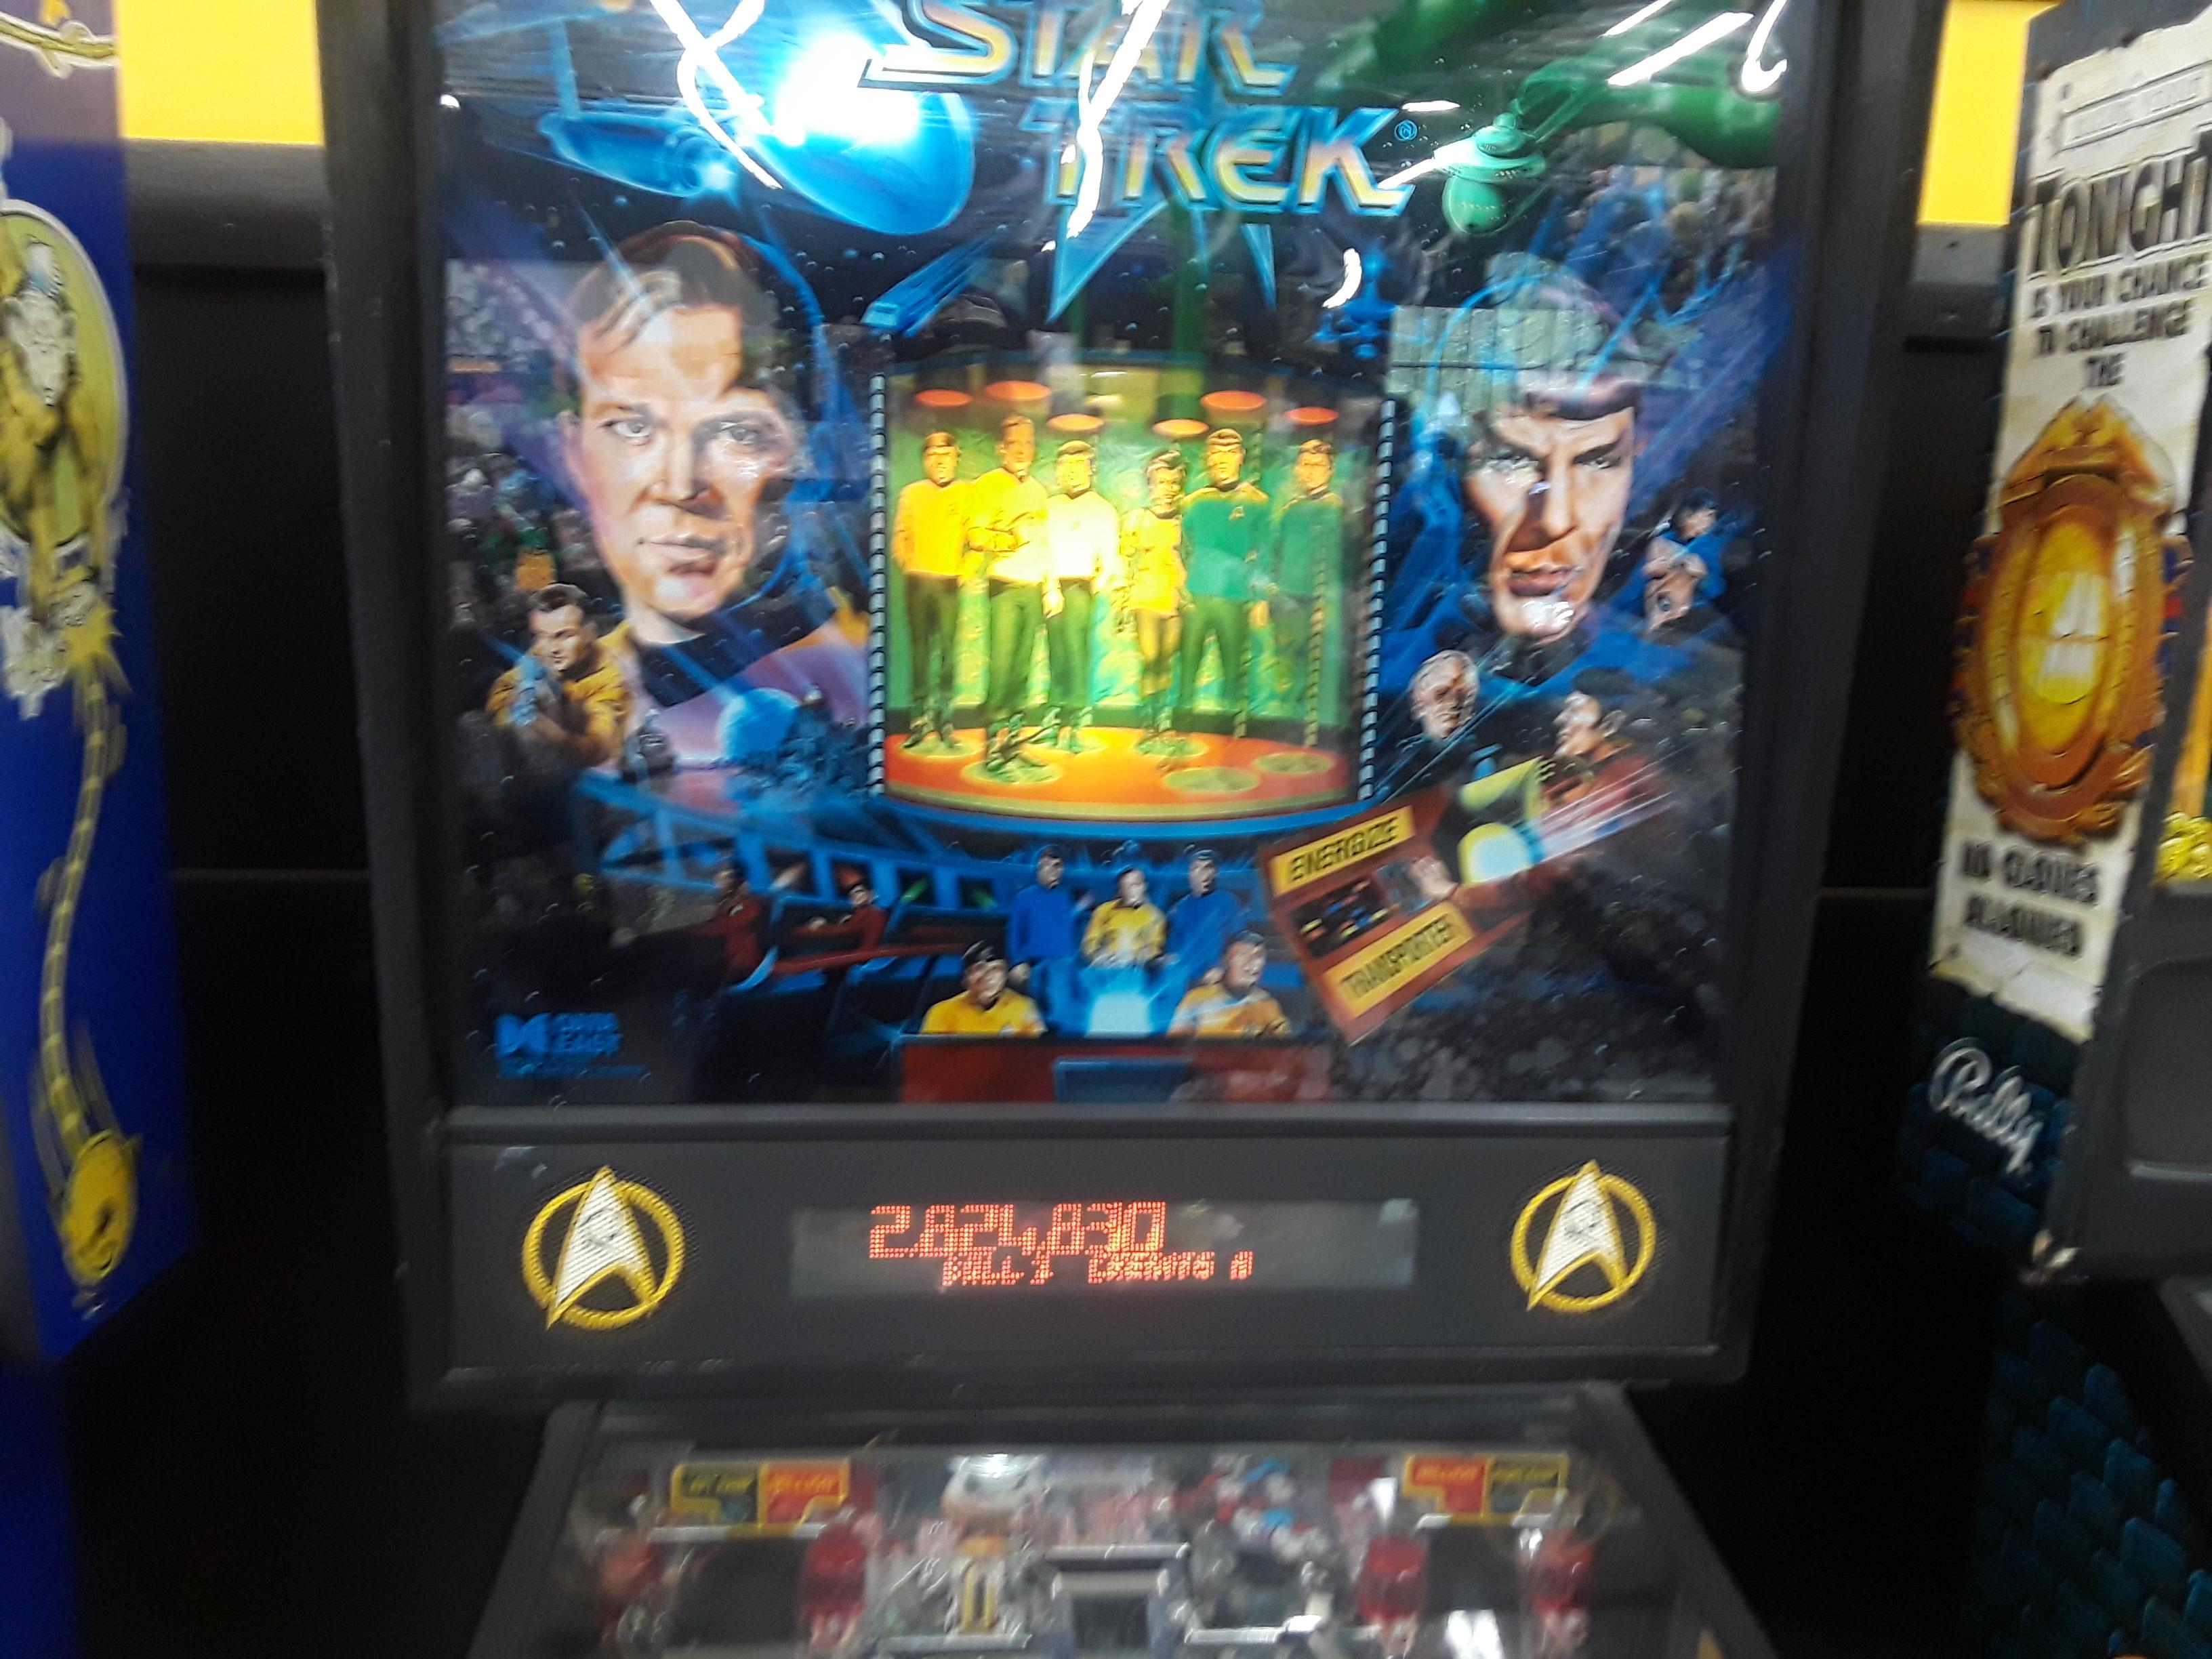 JML101582: Star Trek (1991 pinball) (Pinball: 3 Balls) 2,824,830 points on 2018-08-04 00:15:53